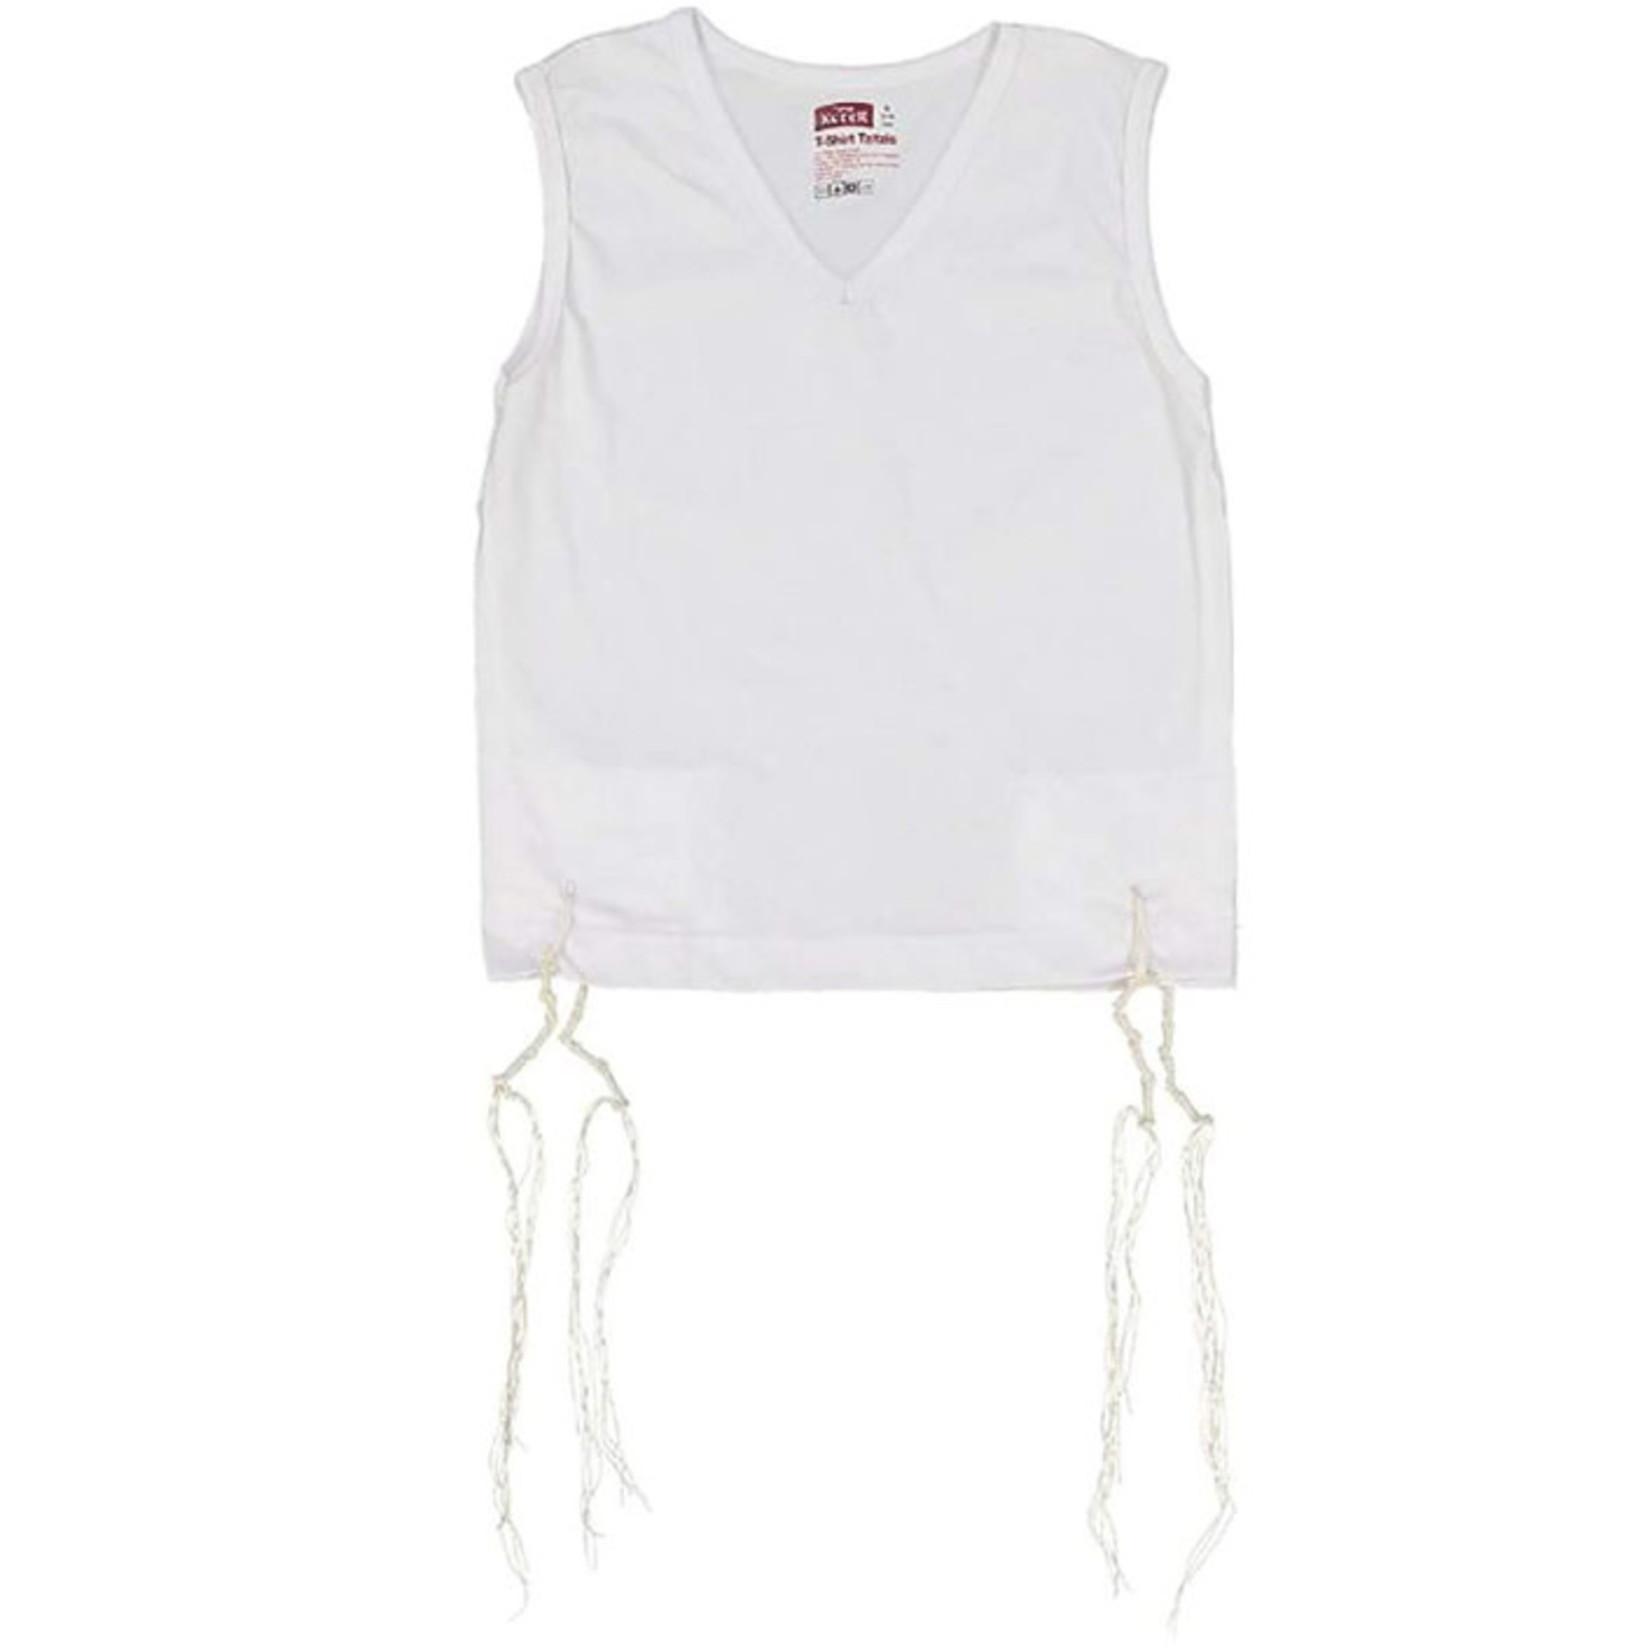 Undershirt-Style Arbah Kanfot, 100% Cotton, V-Neck, Size 3